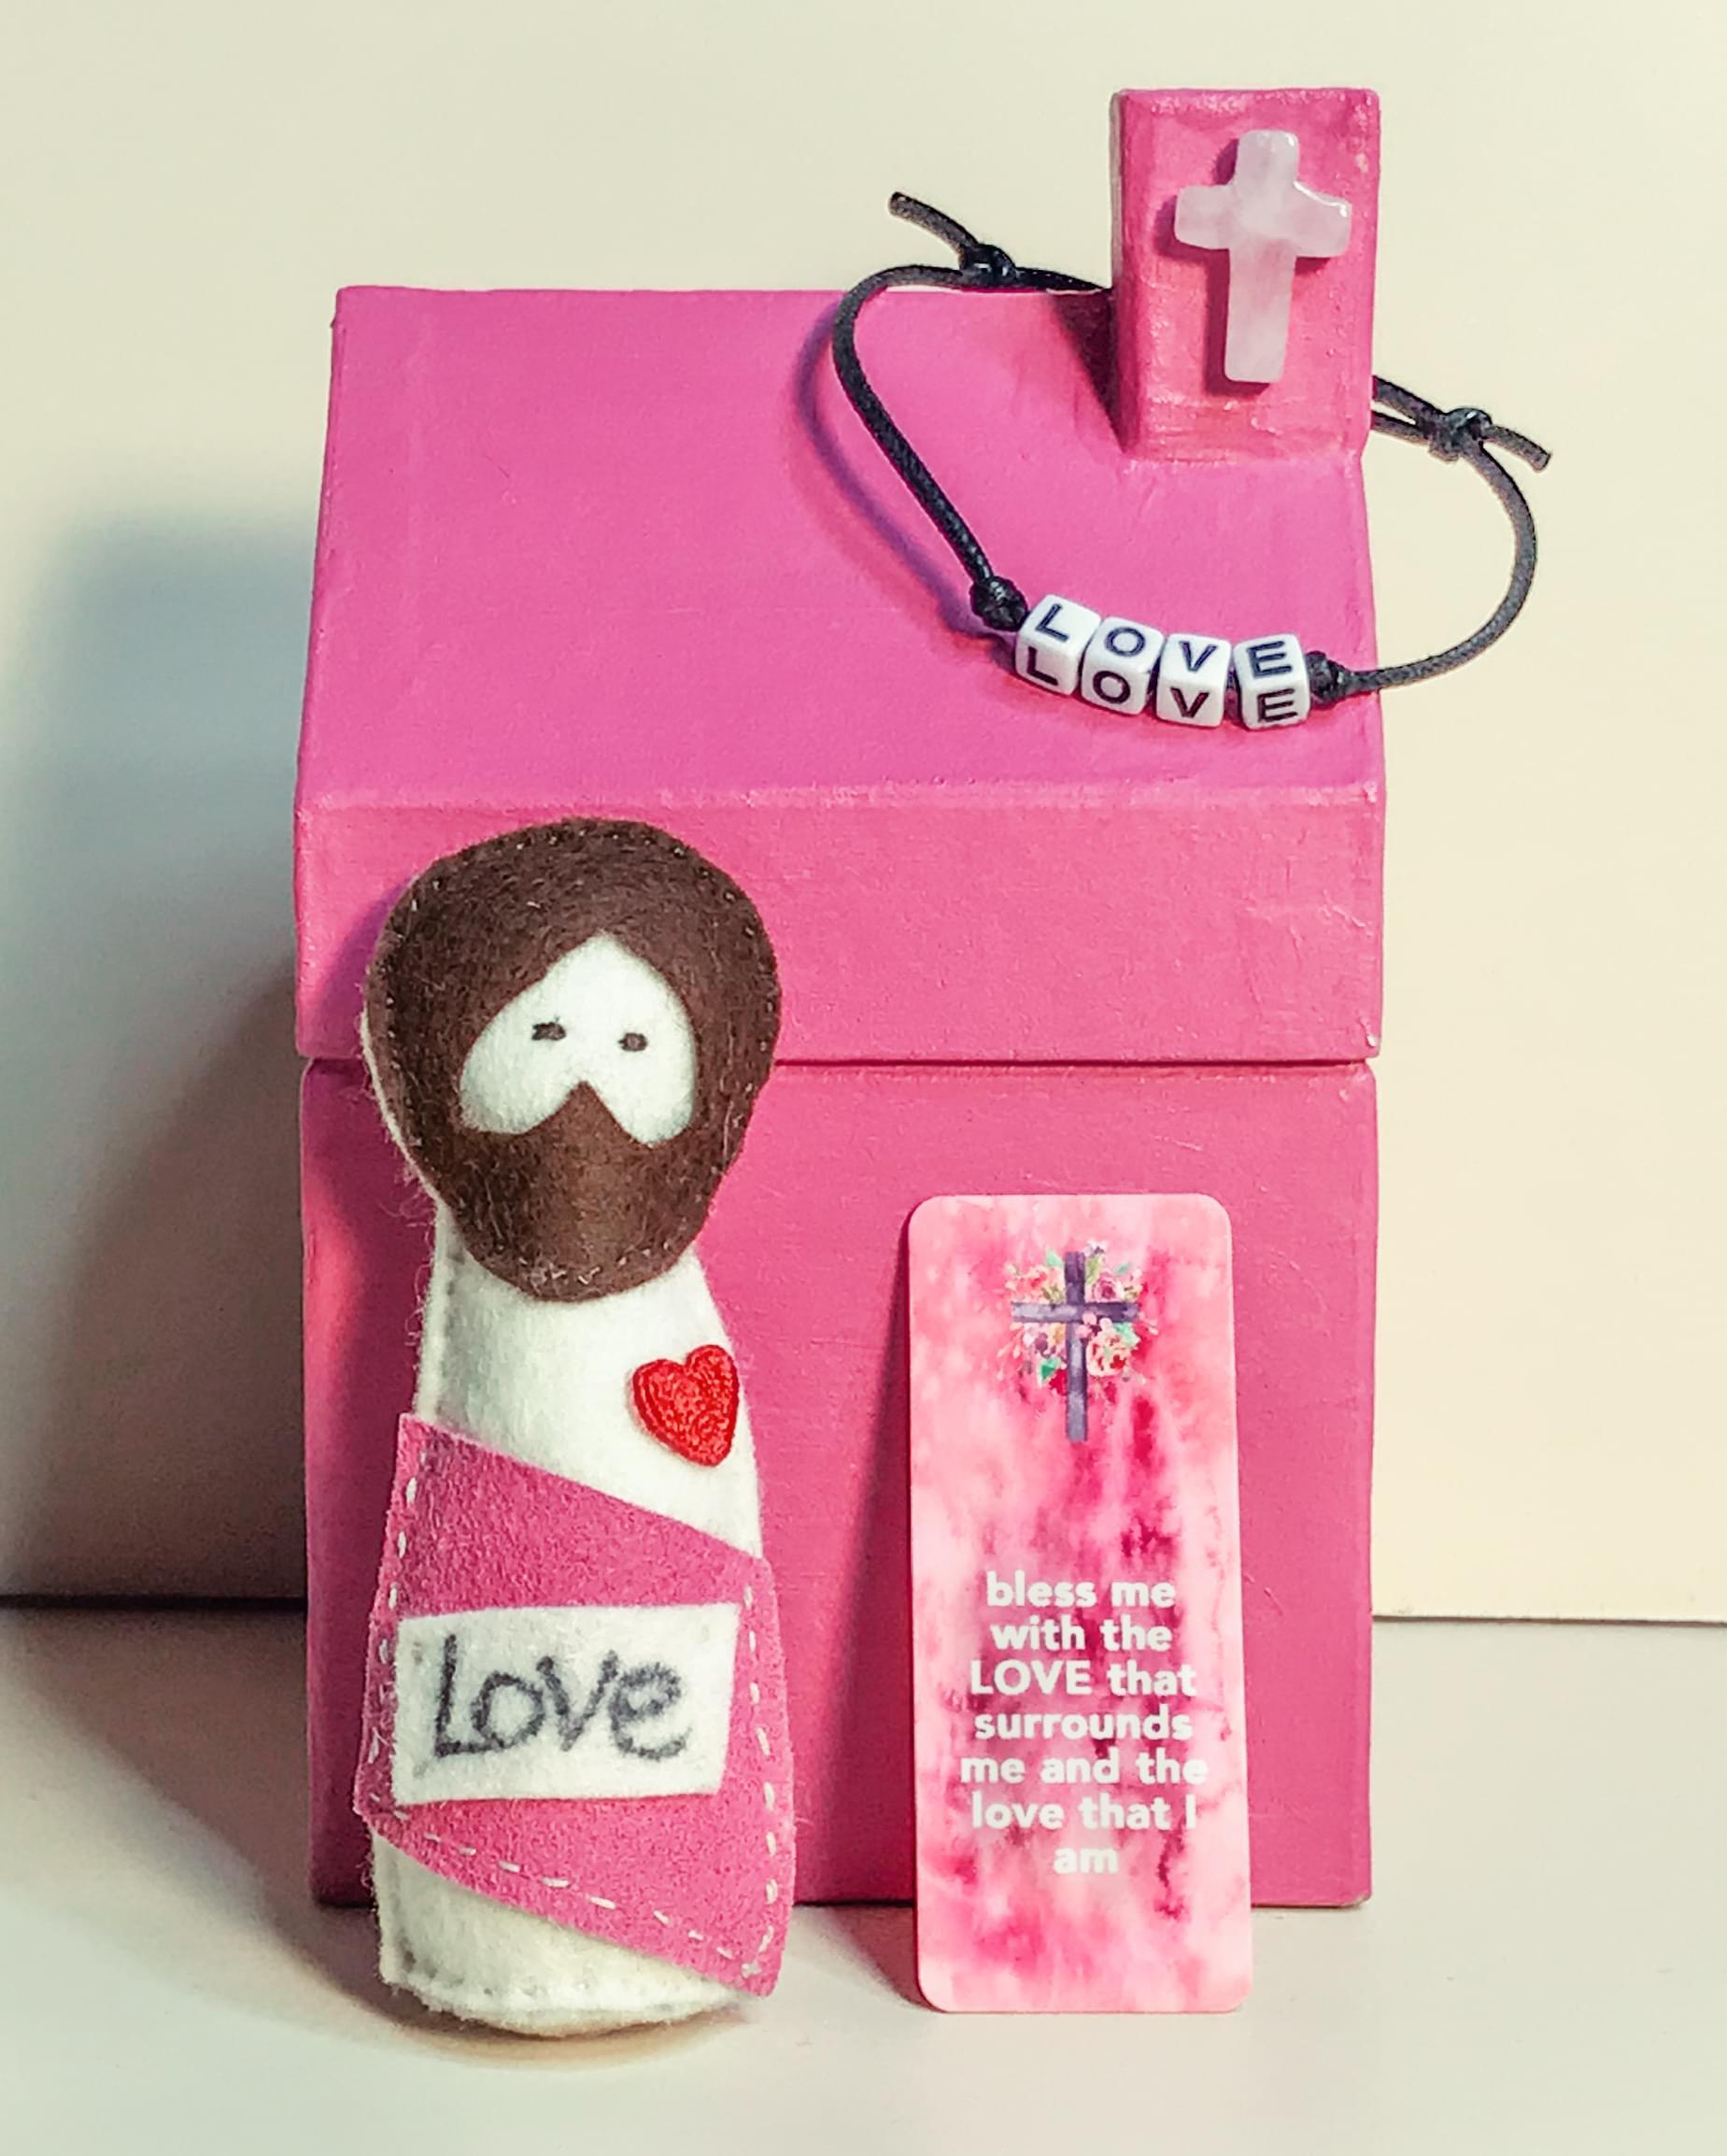 Pocket_jesus_doll_love_01.min